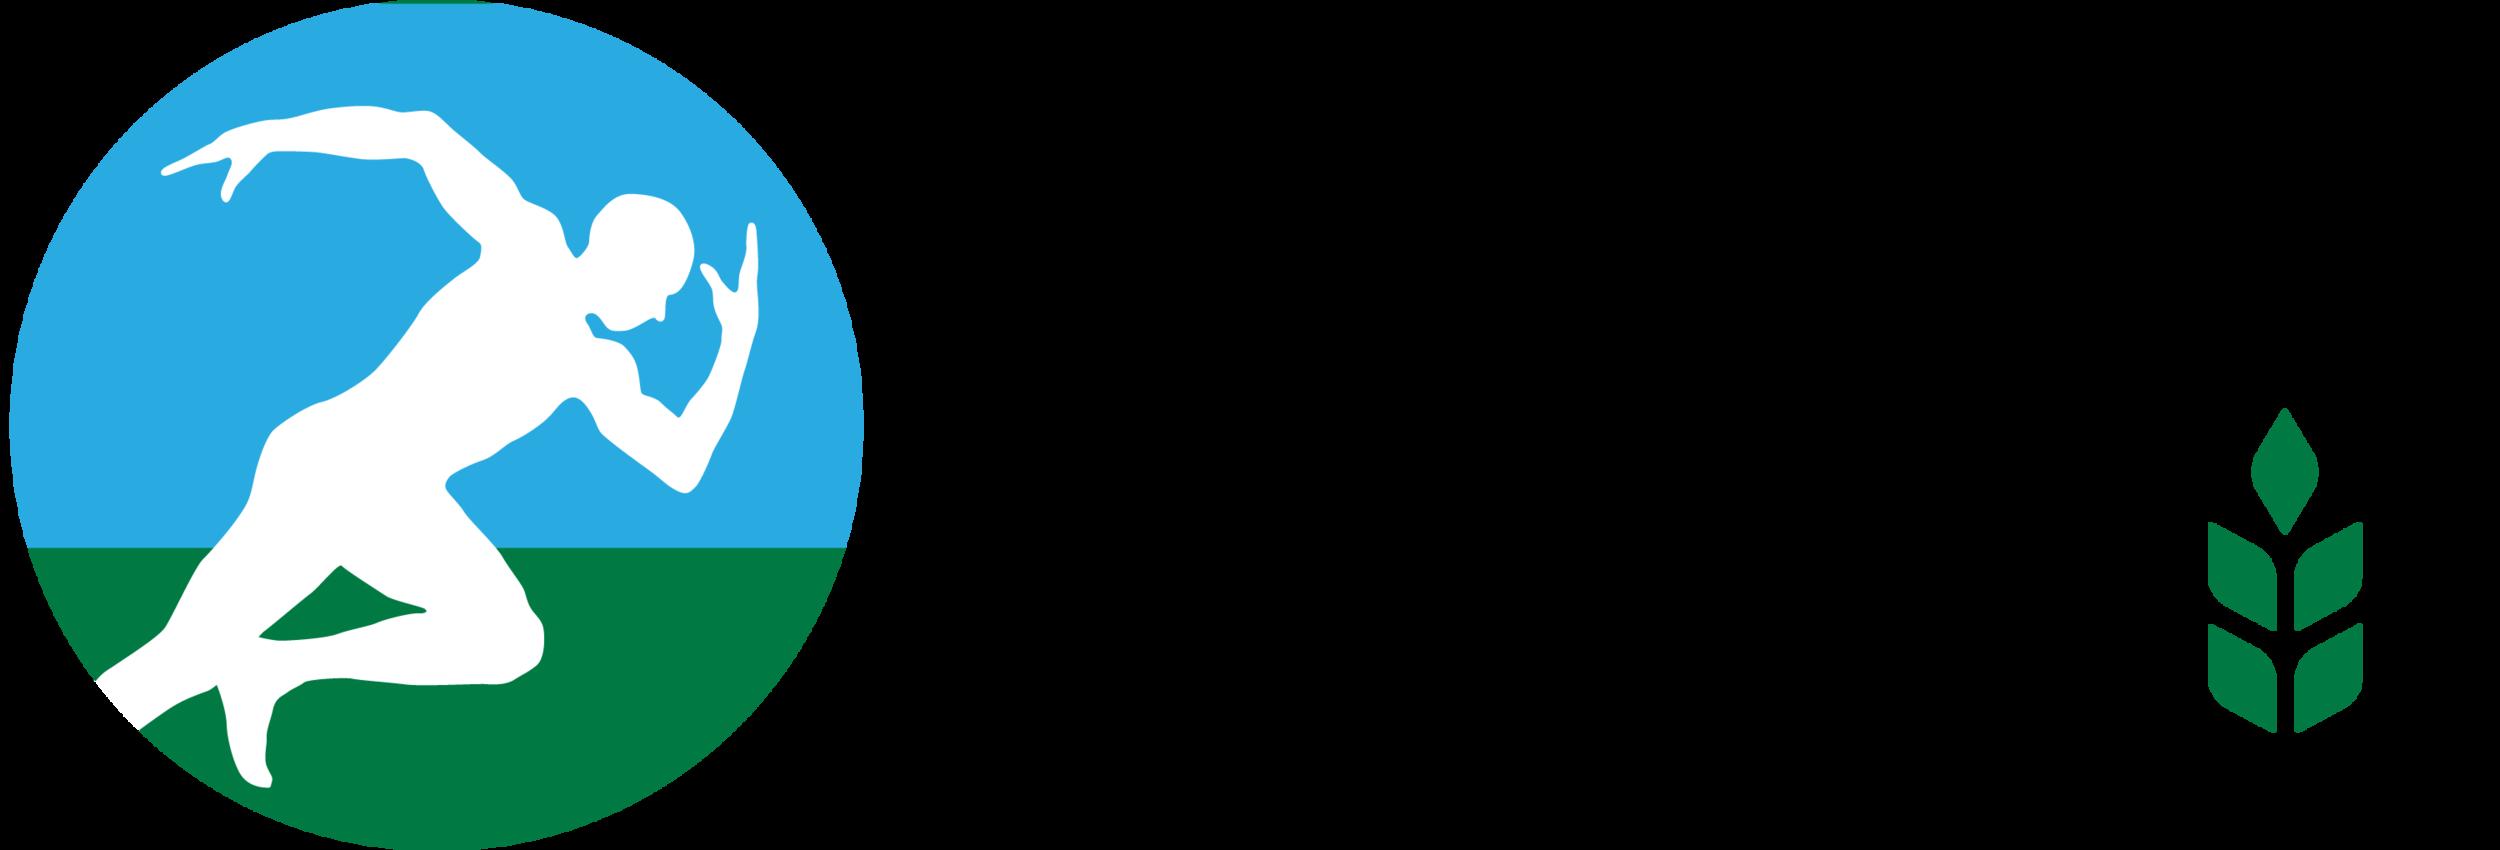 Prairie-Orthopaedics-Logo-horizontal.png